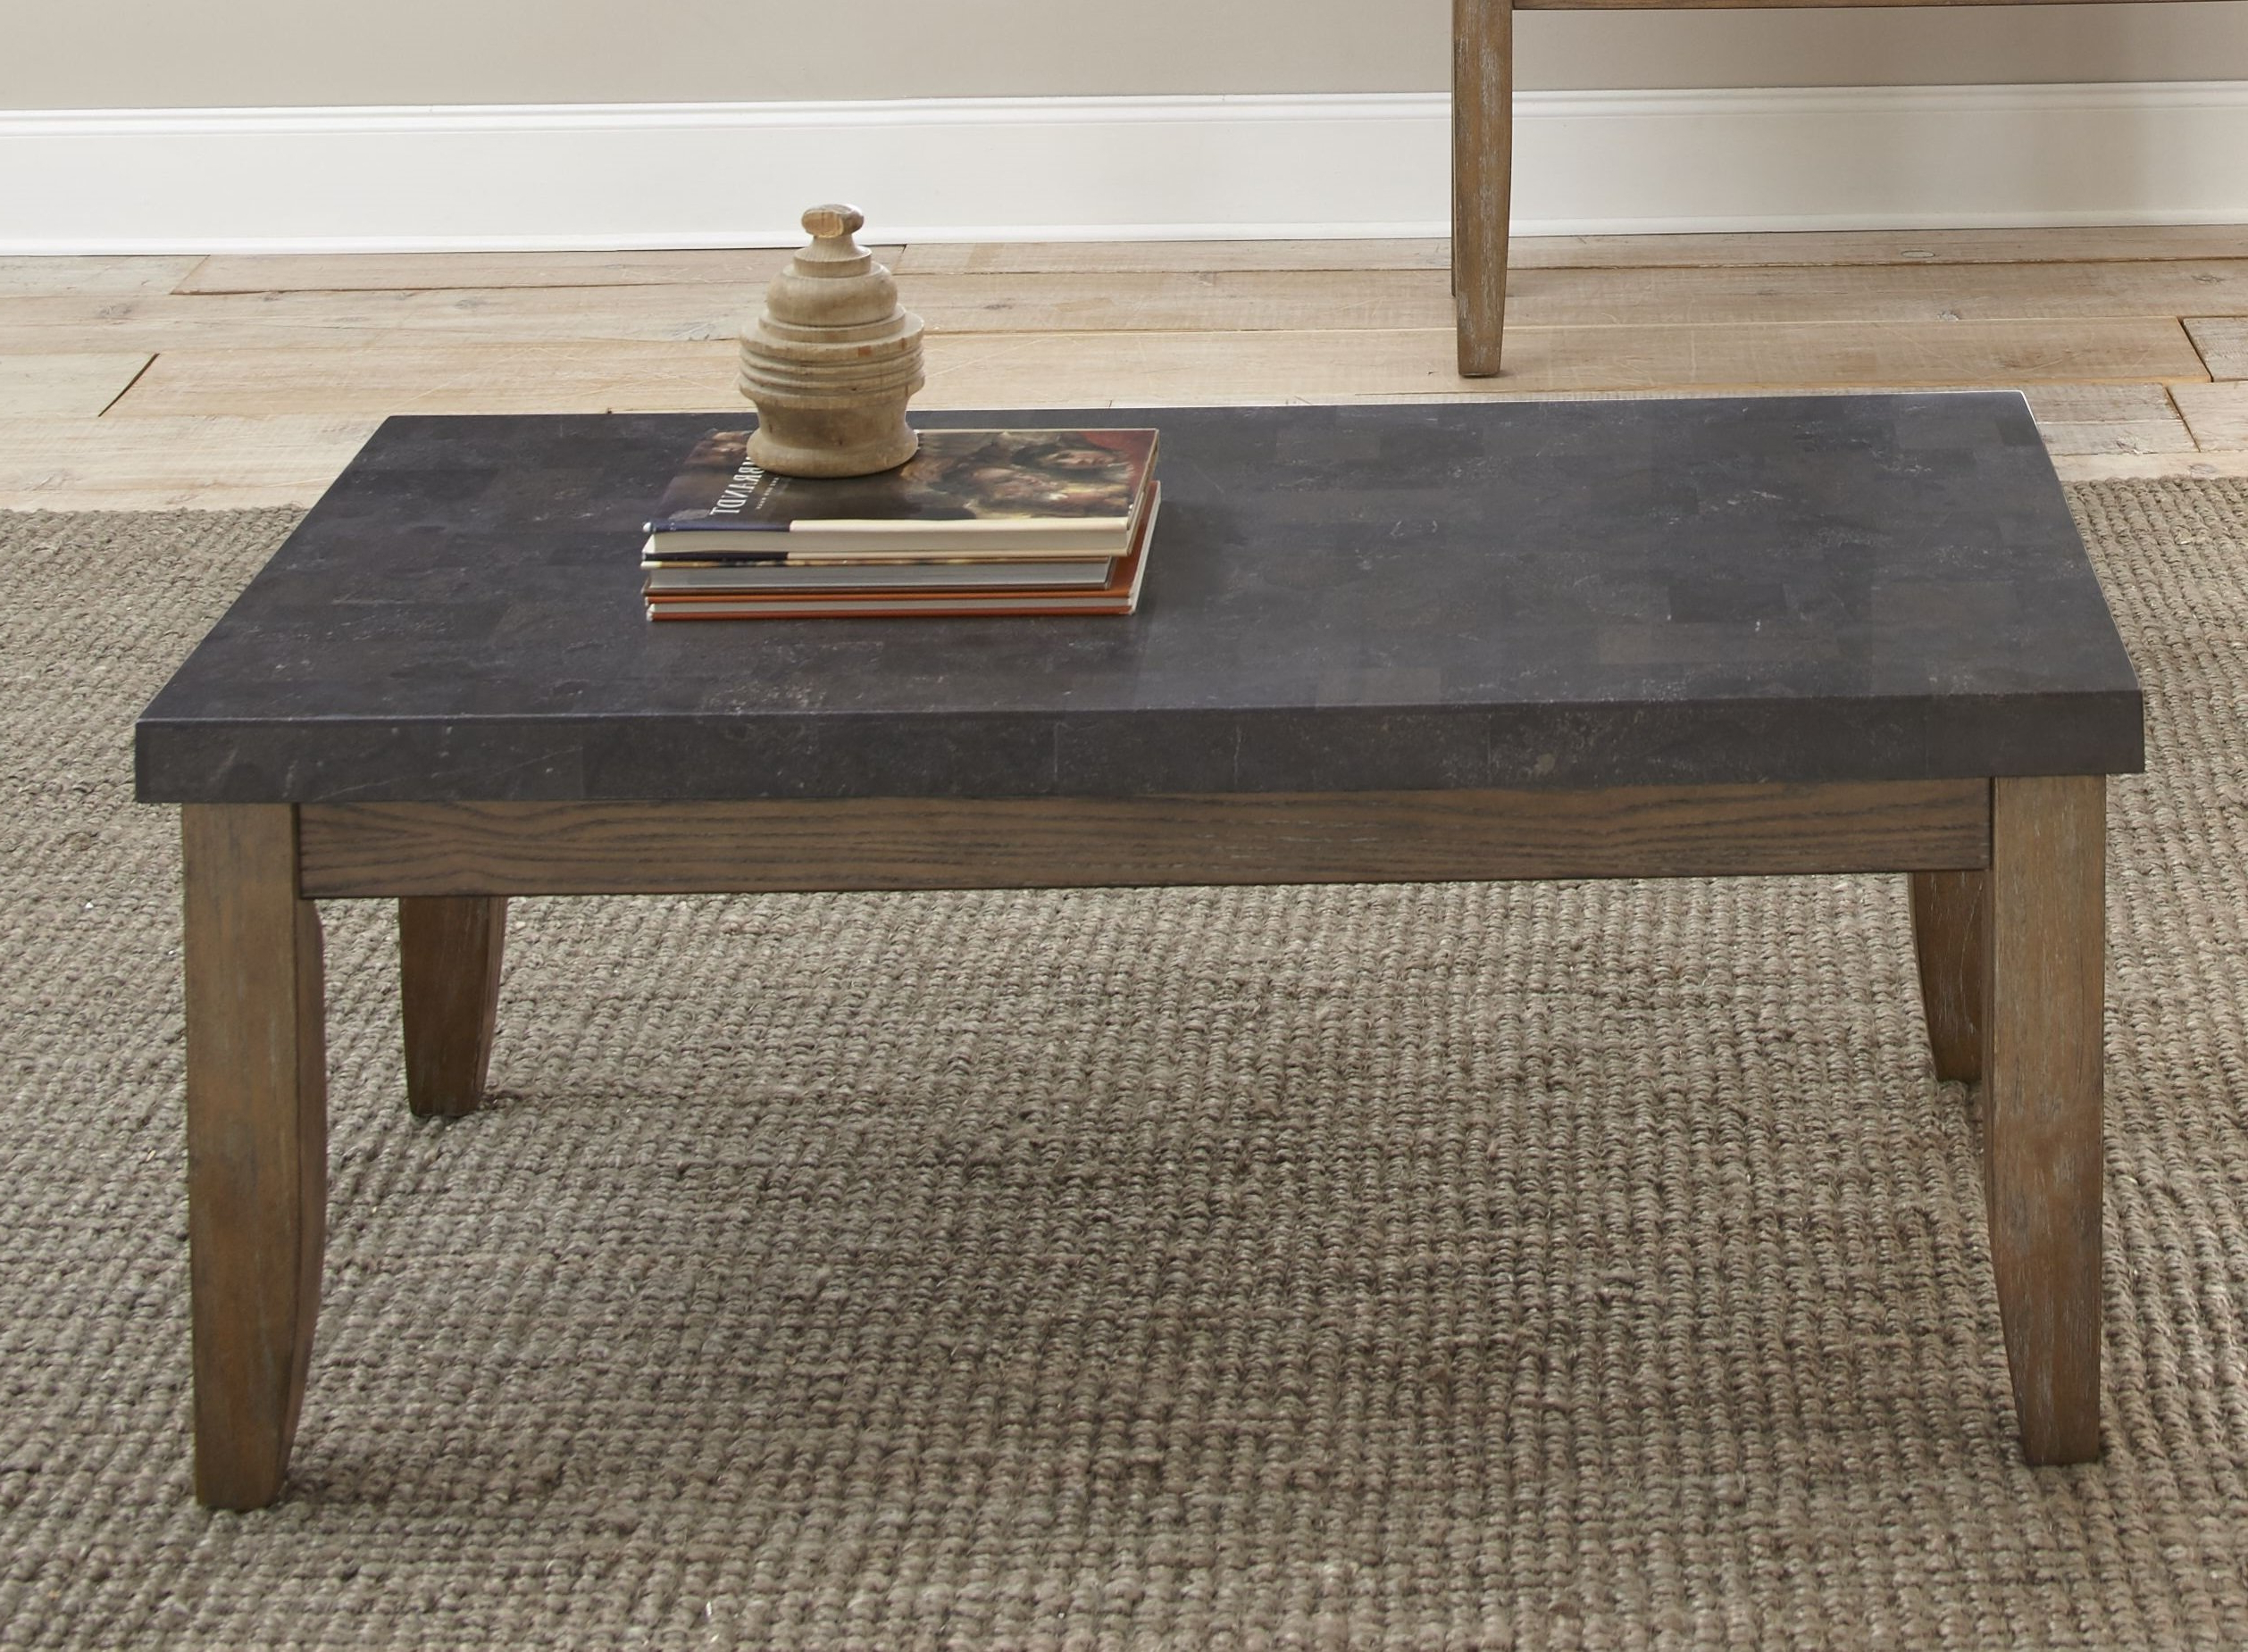 Wayfair Intended For Favorite Bluestone Rustic Black Coffee Tables (View 2 of 20)